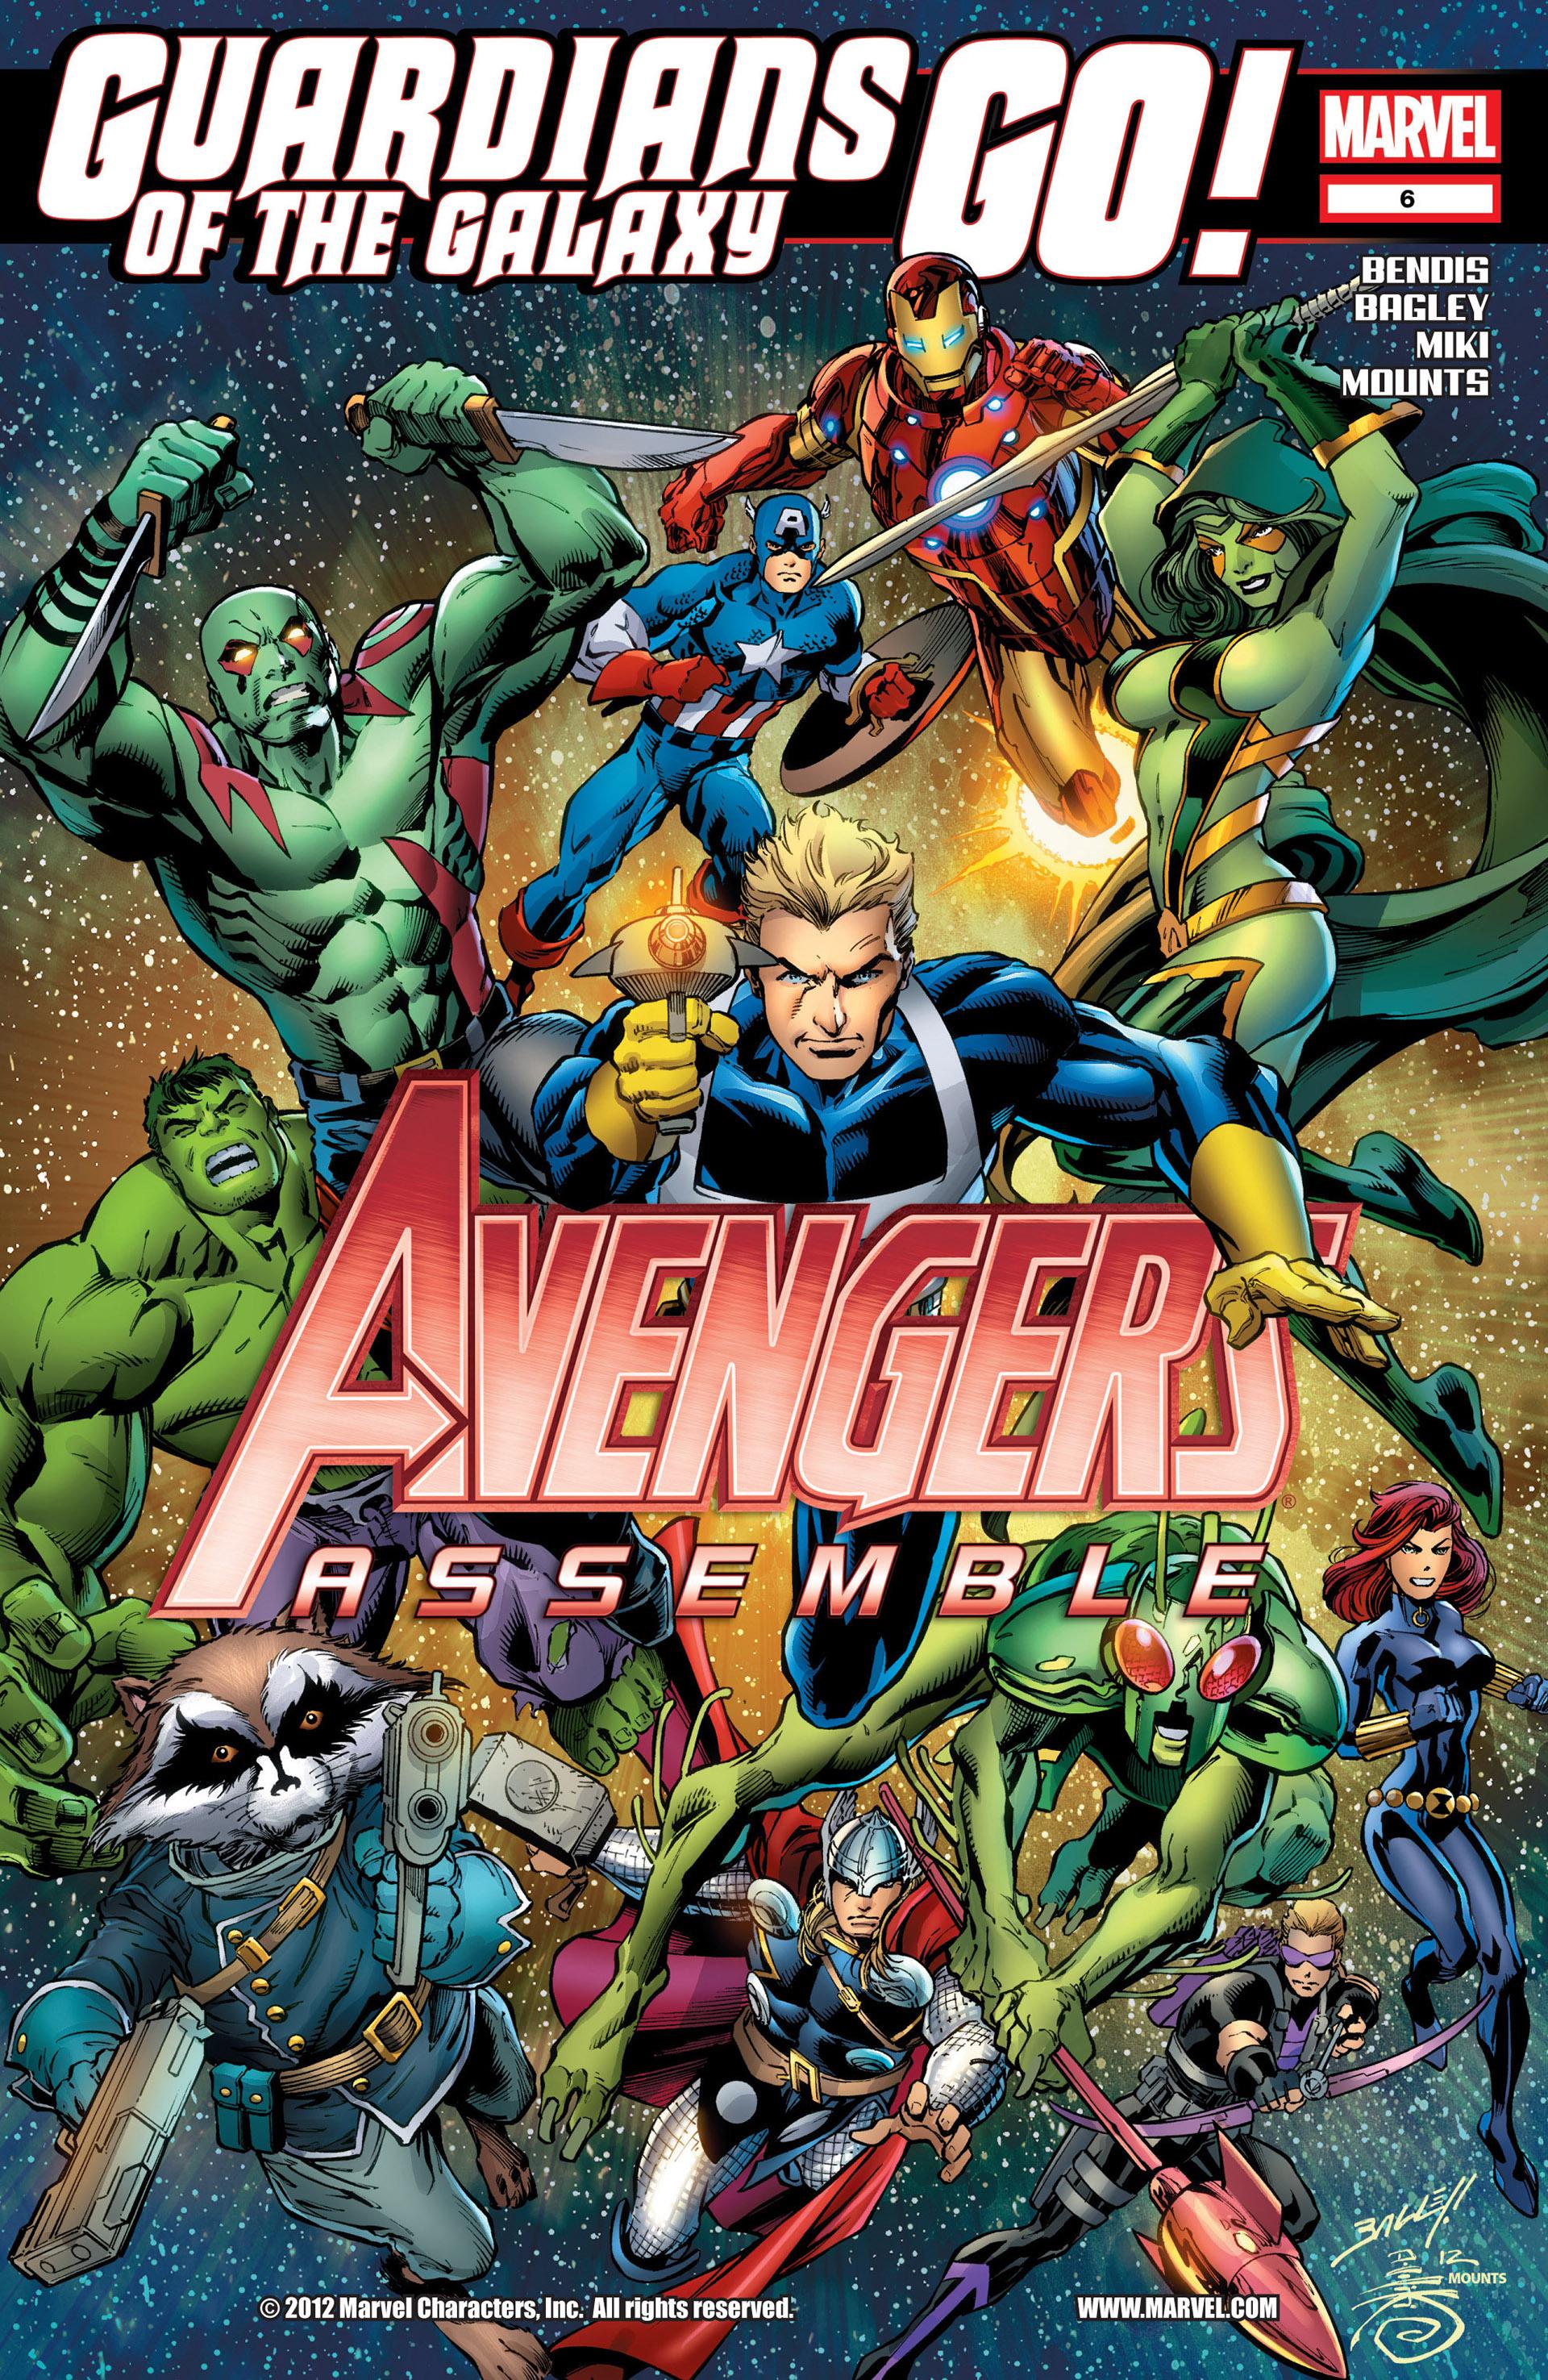 Avengers Assemble (2012) 6 Page 1